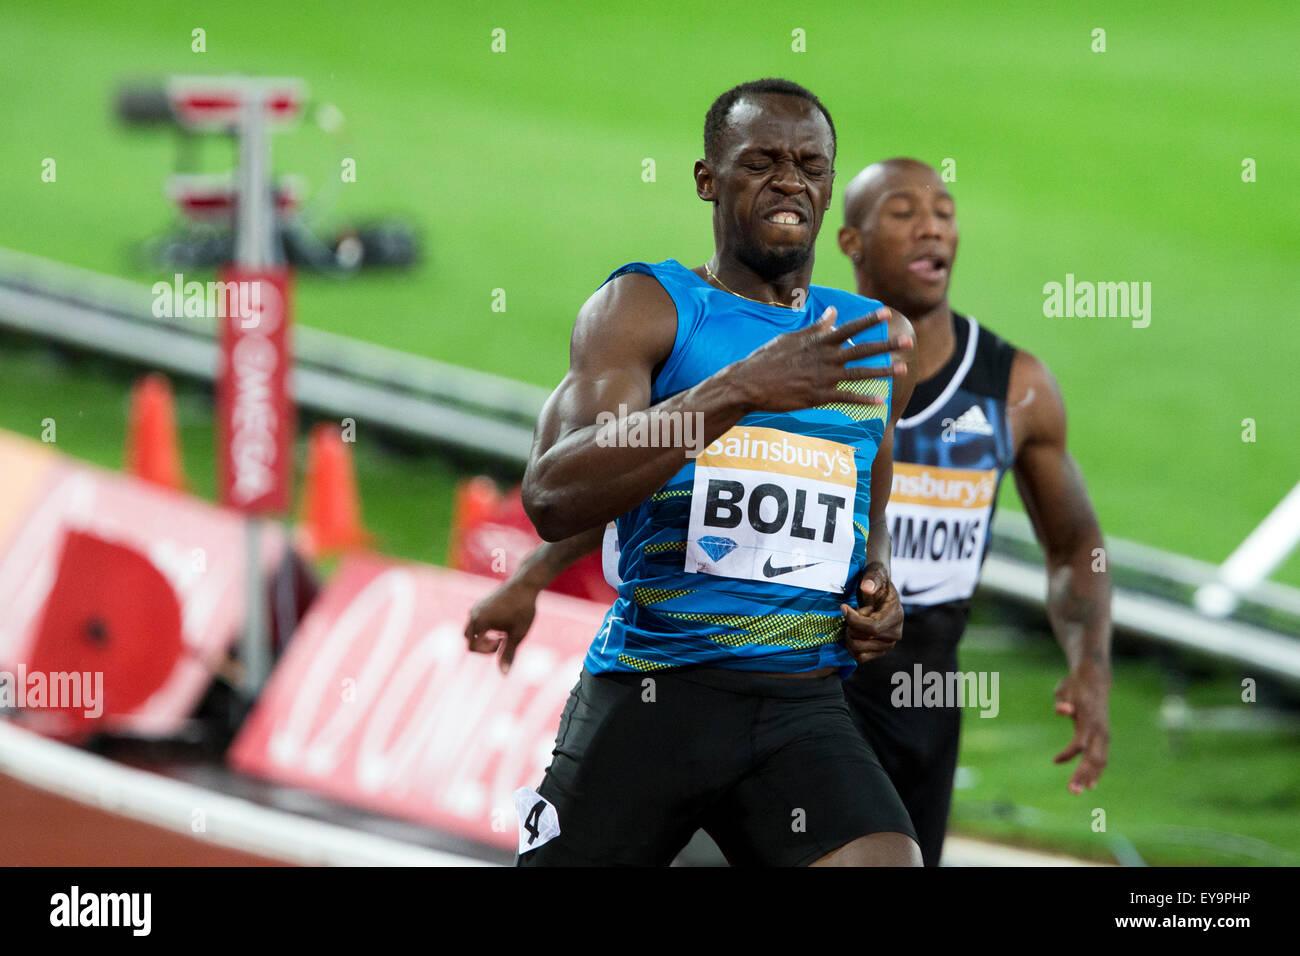 Londres, Reino Unido. 24 de julio de 2015. Usain Bolt, la final masculina de los 100 metros, Diamond League Sainsbury's Imagen De Stock